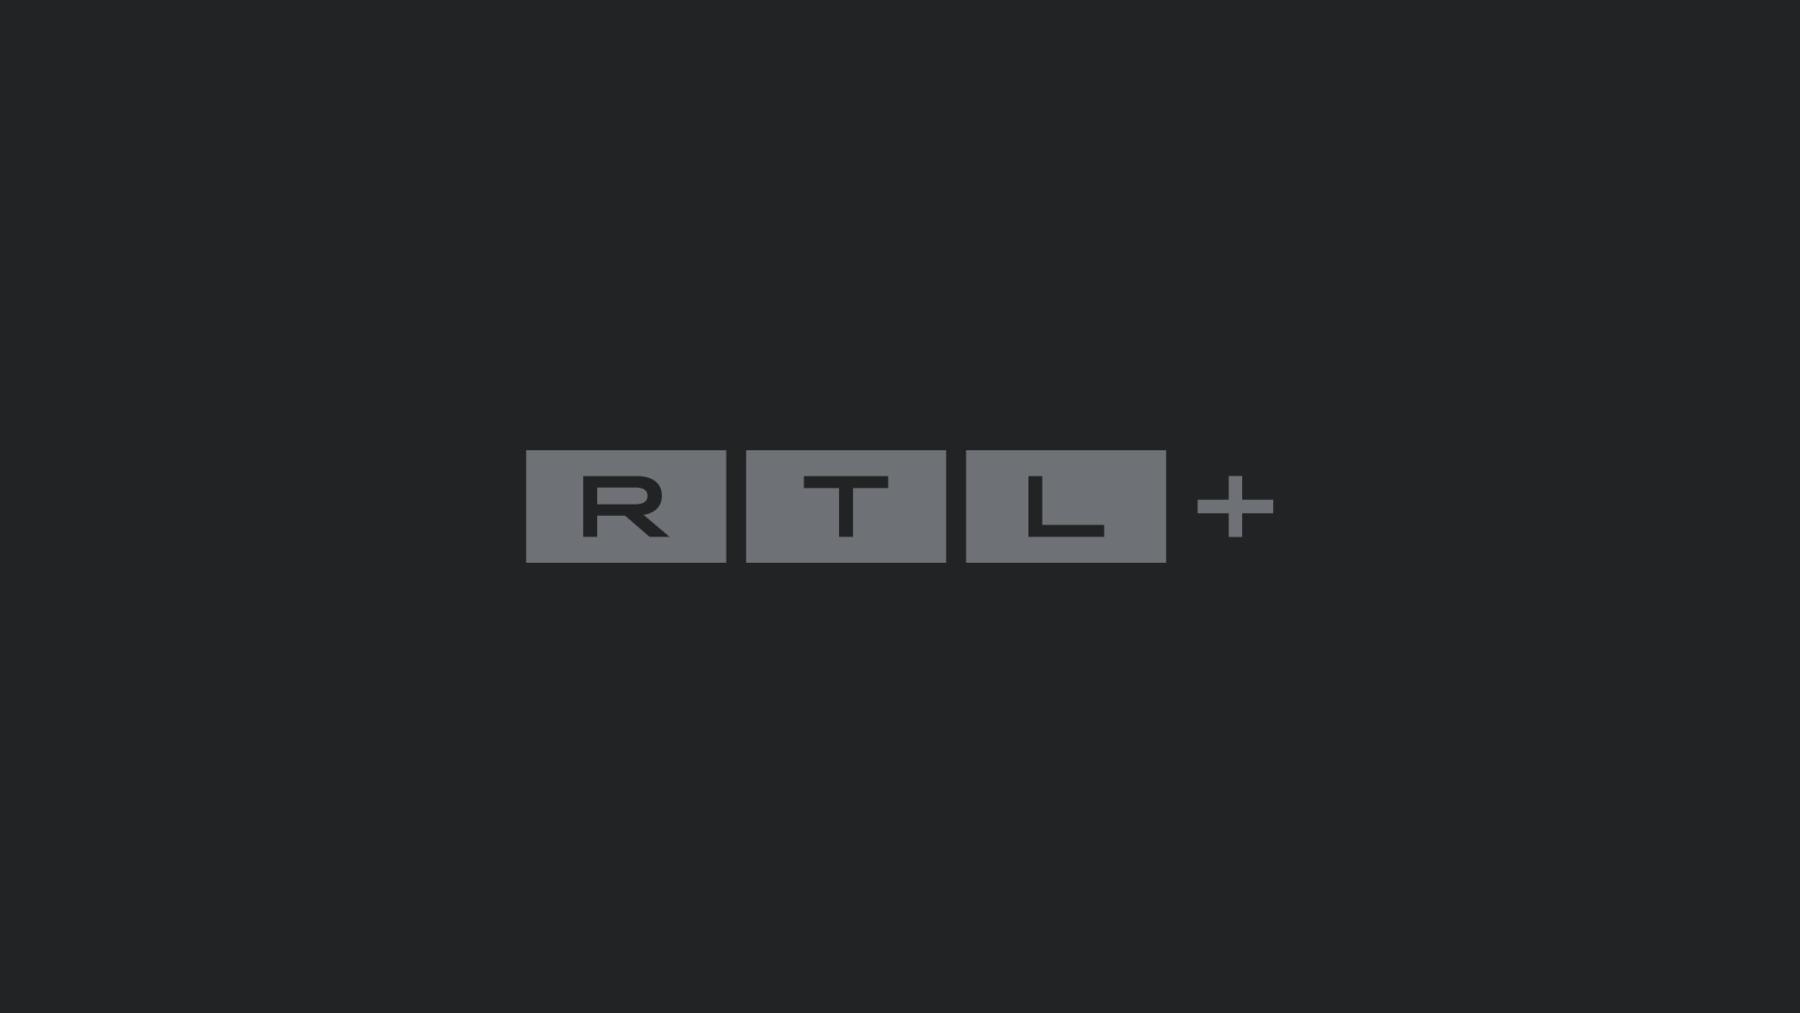 Teil 1/2, Punkt 12 - Das RTL-Mittagsjournal